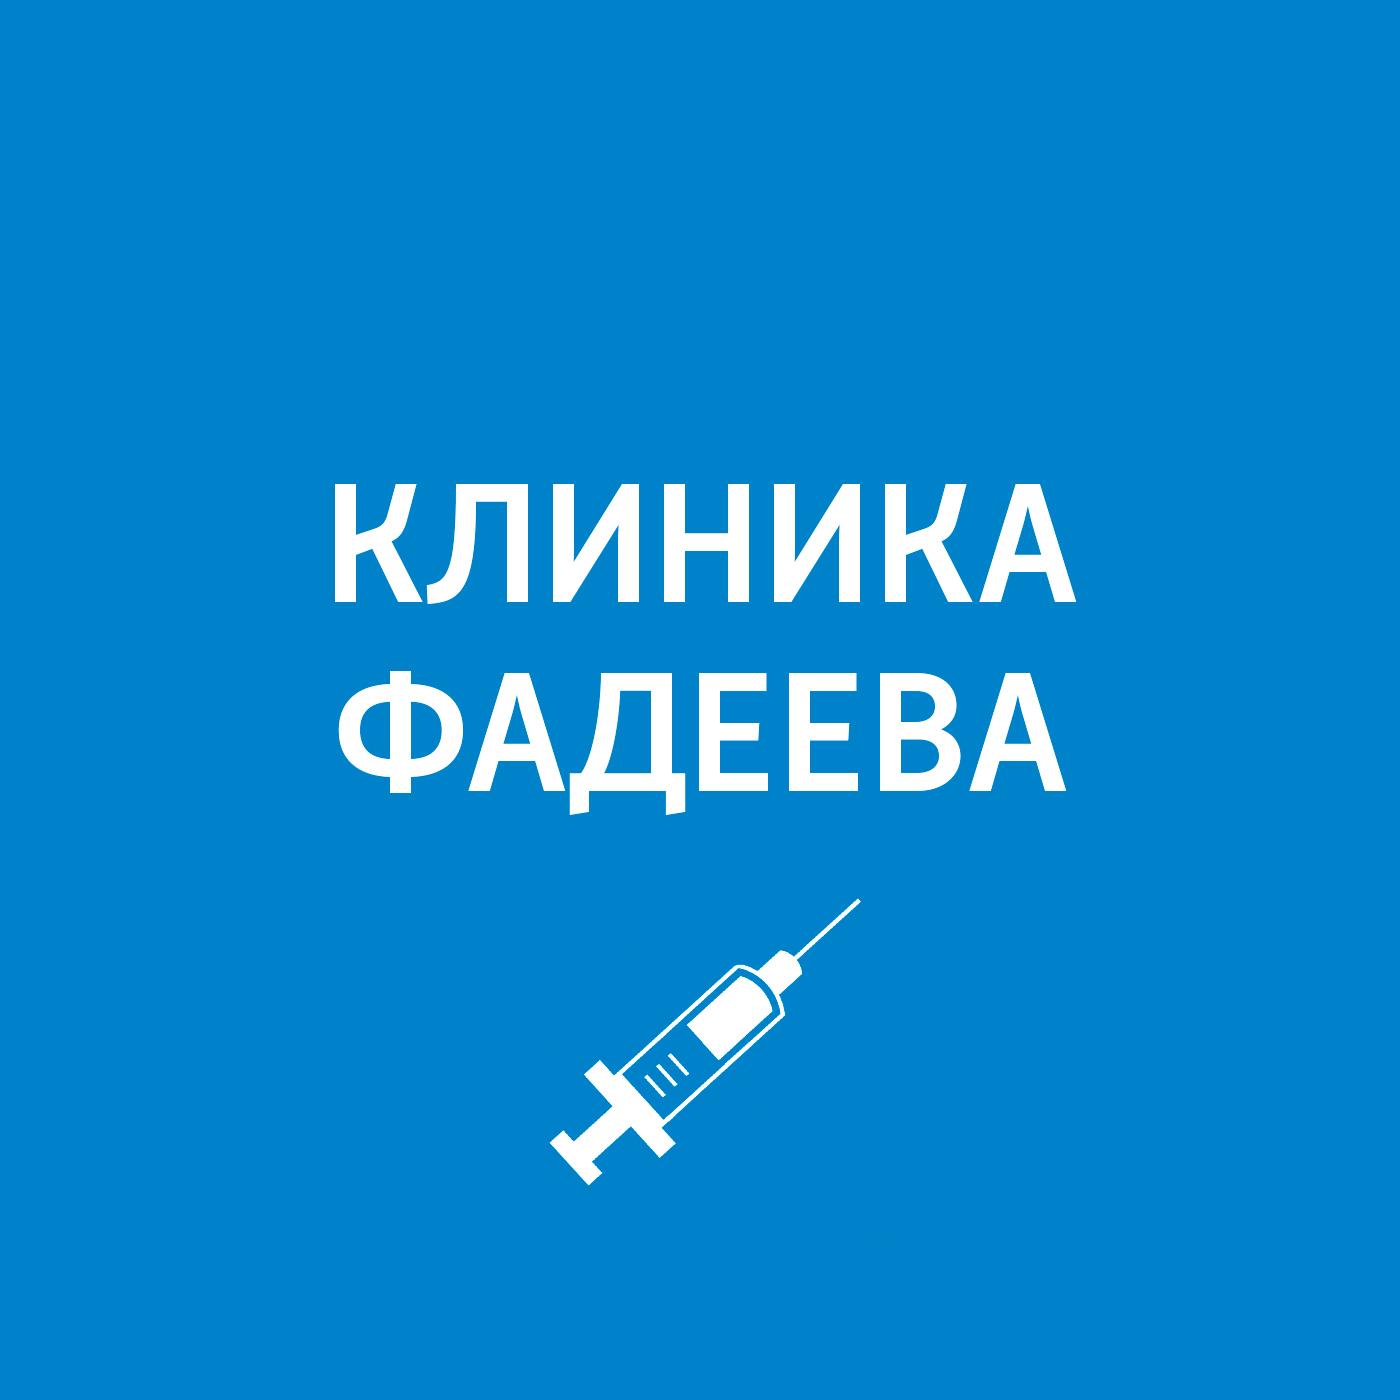 Пётр Фадеев Неврология цена 2017